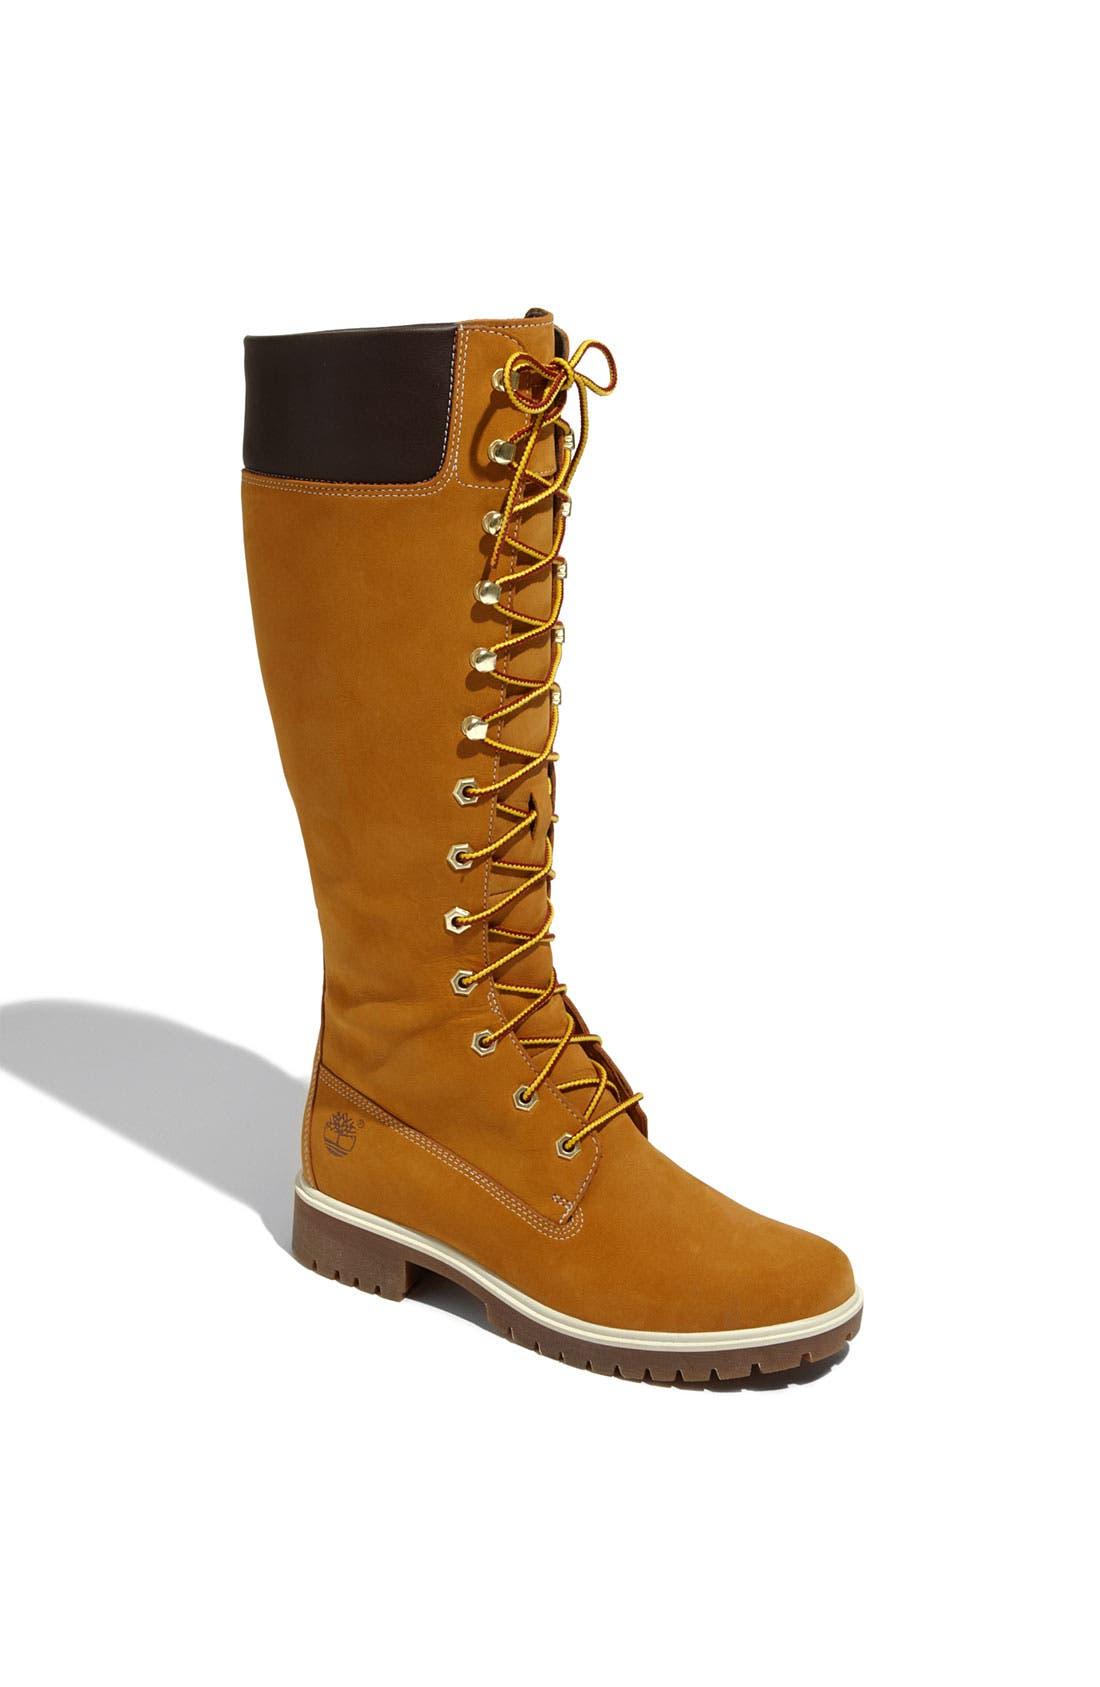 Alternate Image 1 Selected - Timberland 'Premium Classic' Boot